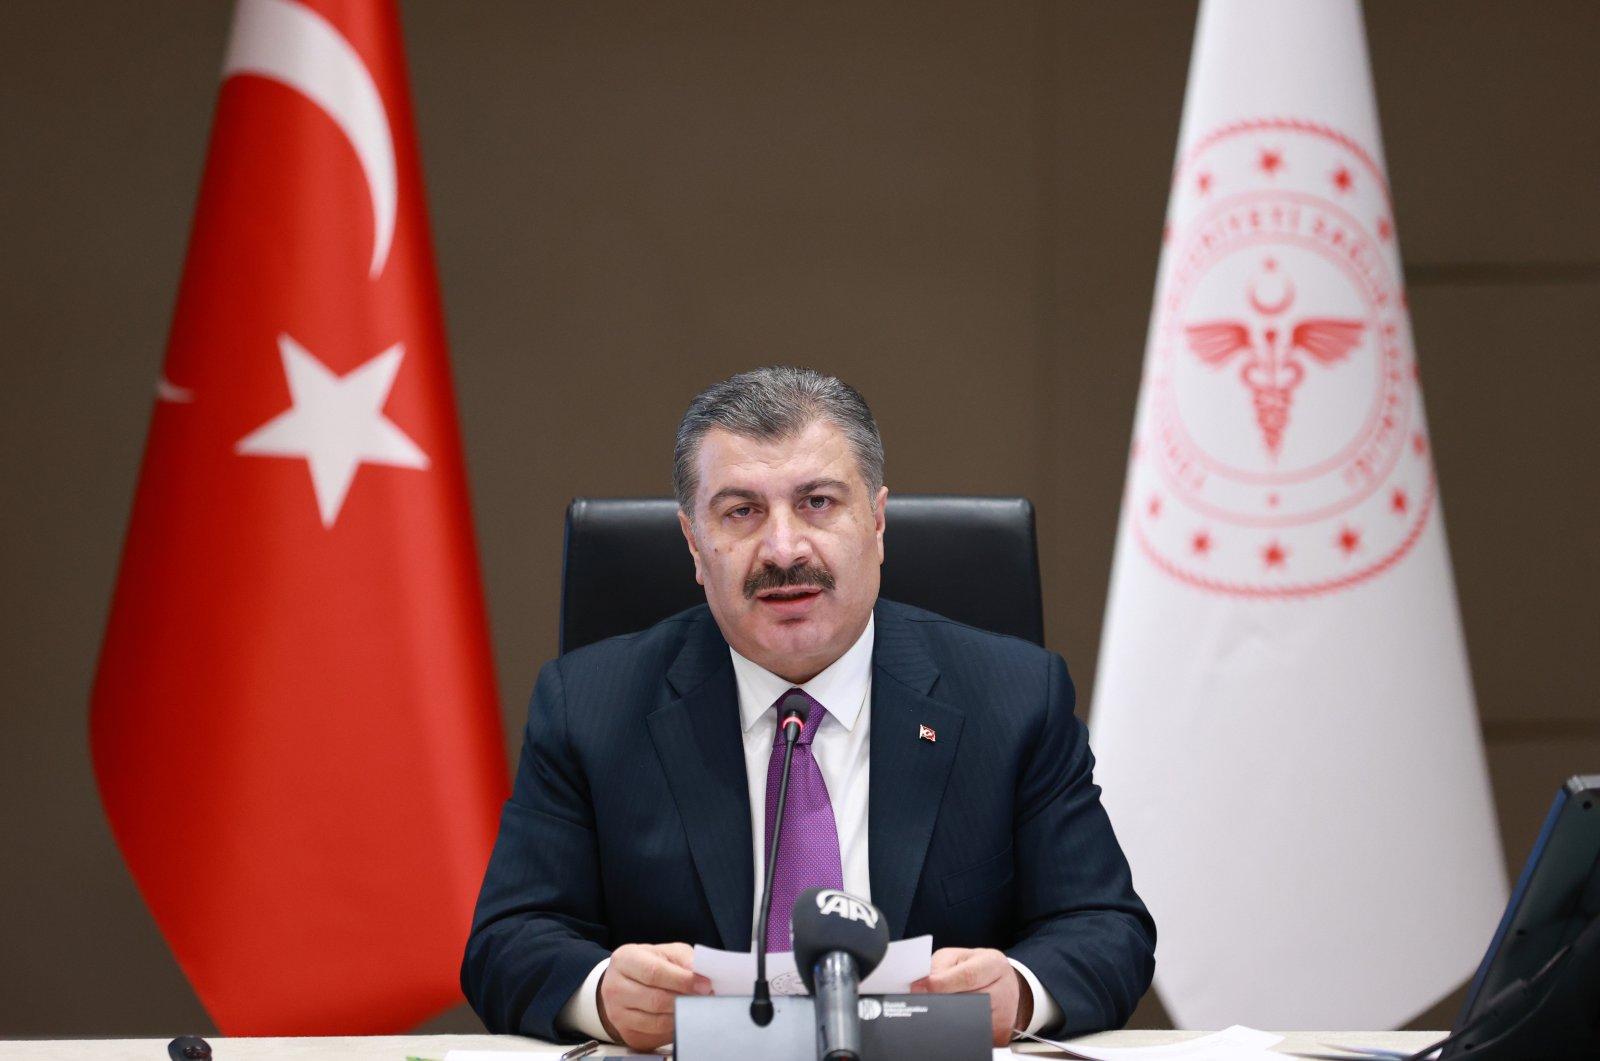 Health Minister Fahrettin Koca speaks at a press conference in the capital Ankara, Turkey, Dec. 24, 2020. (İHA PHOTO)